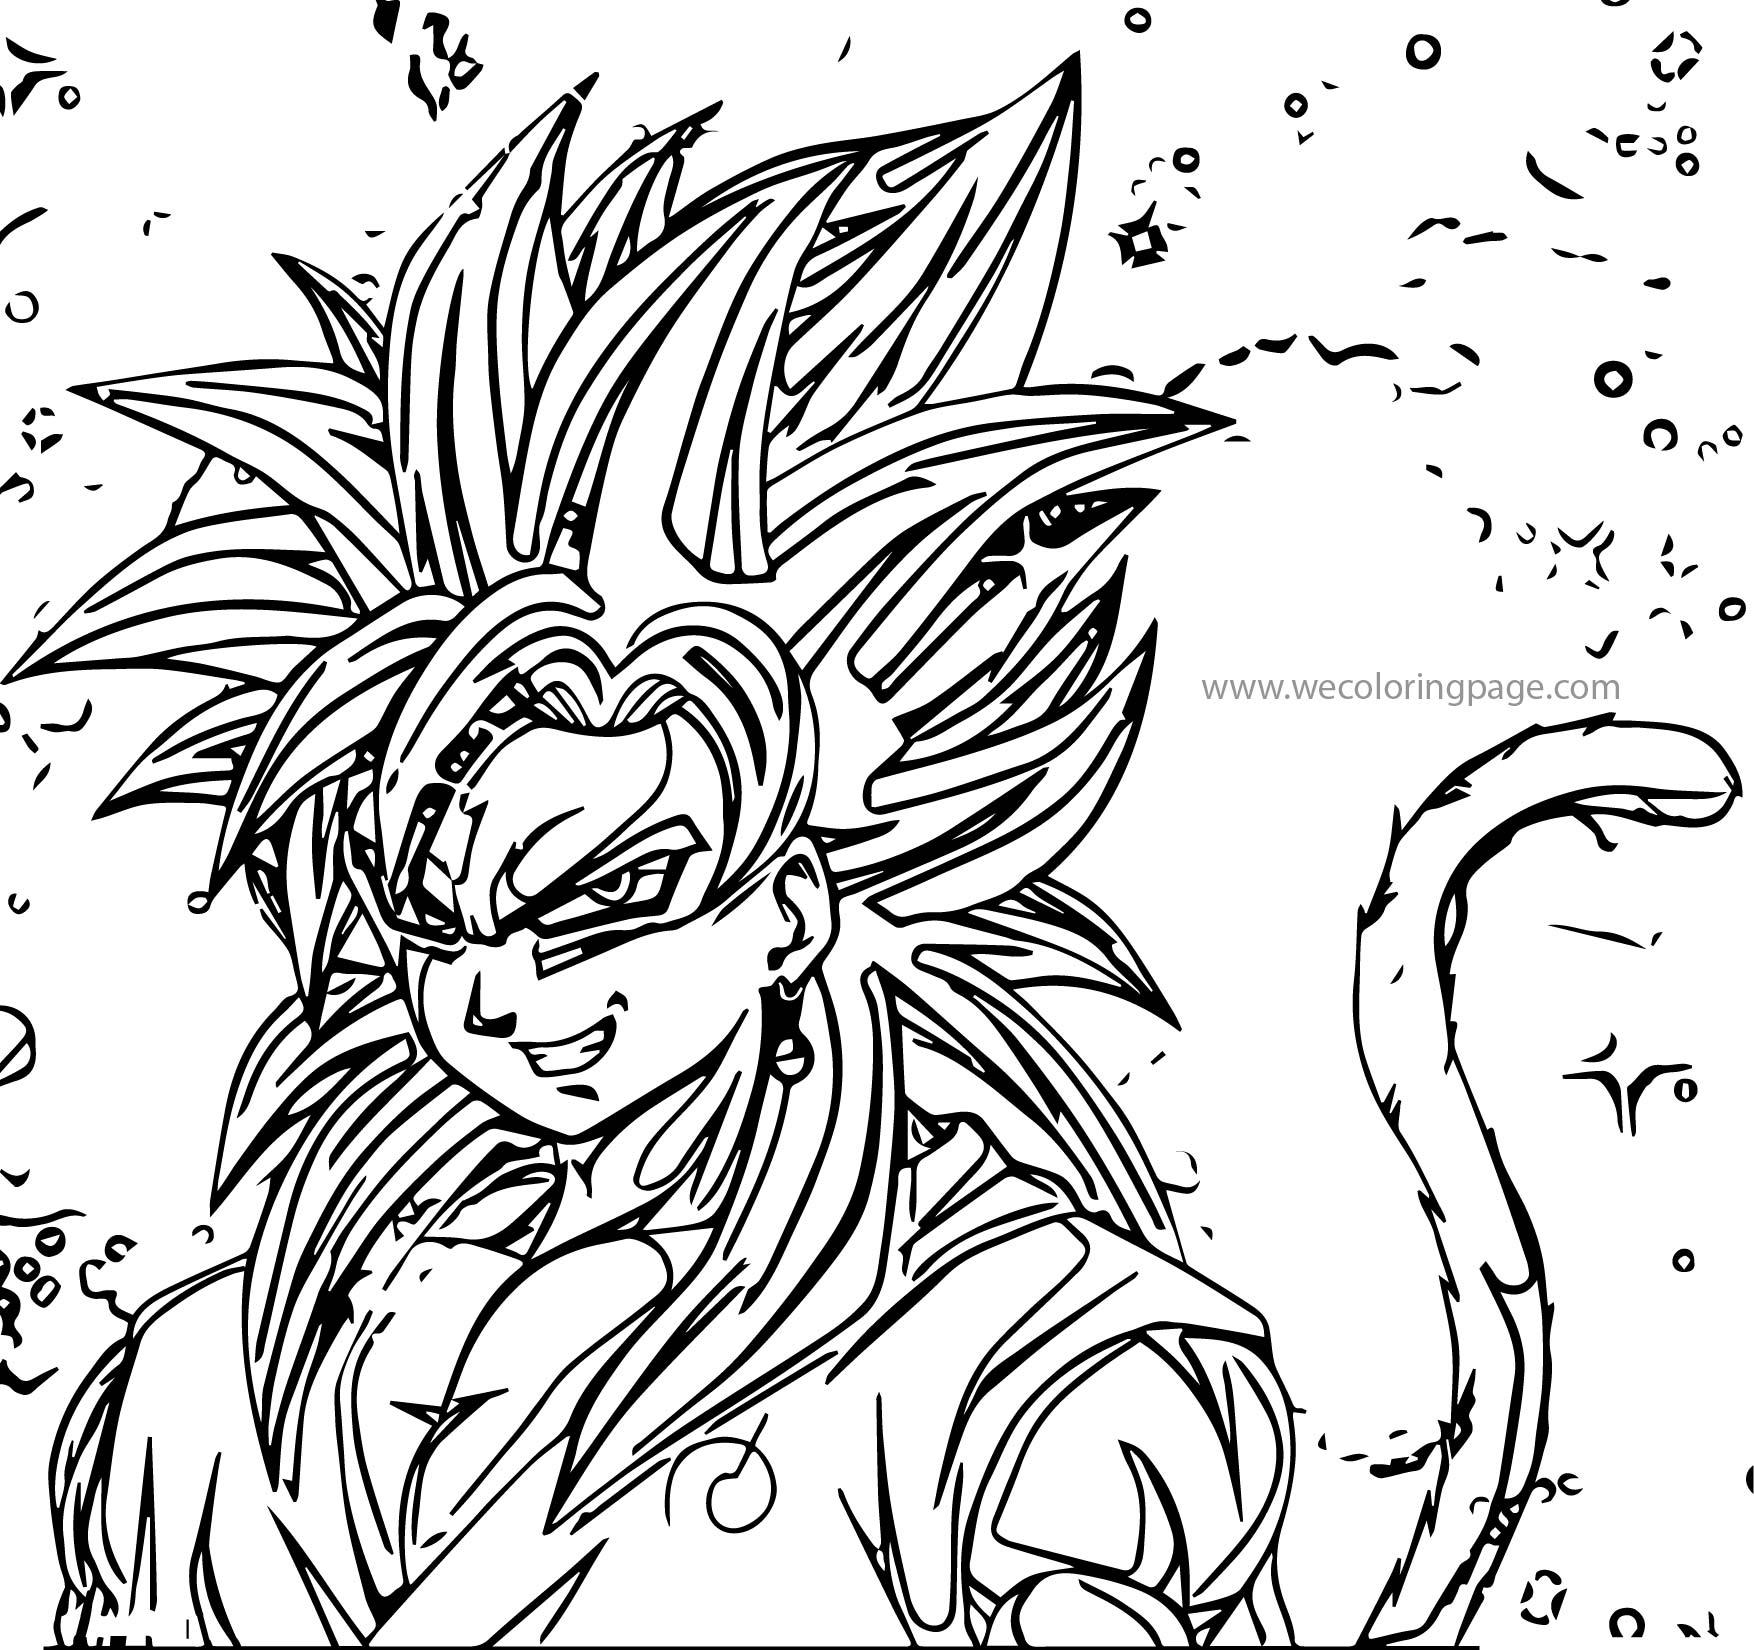 Goku We Coloring Page 206